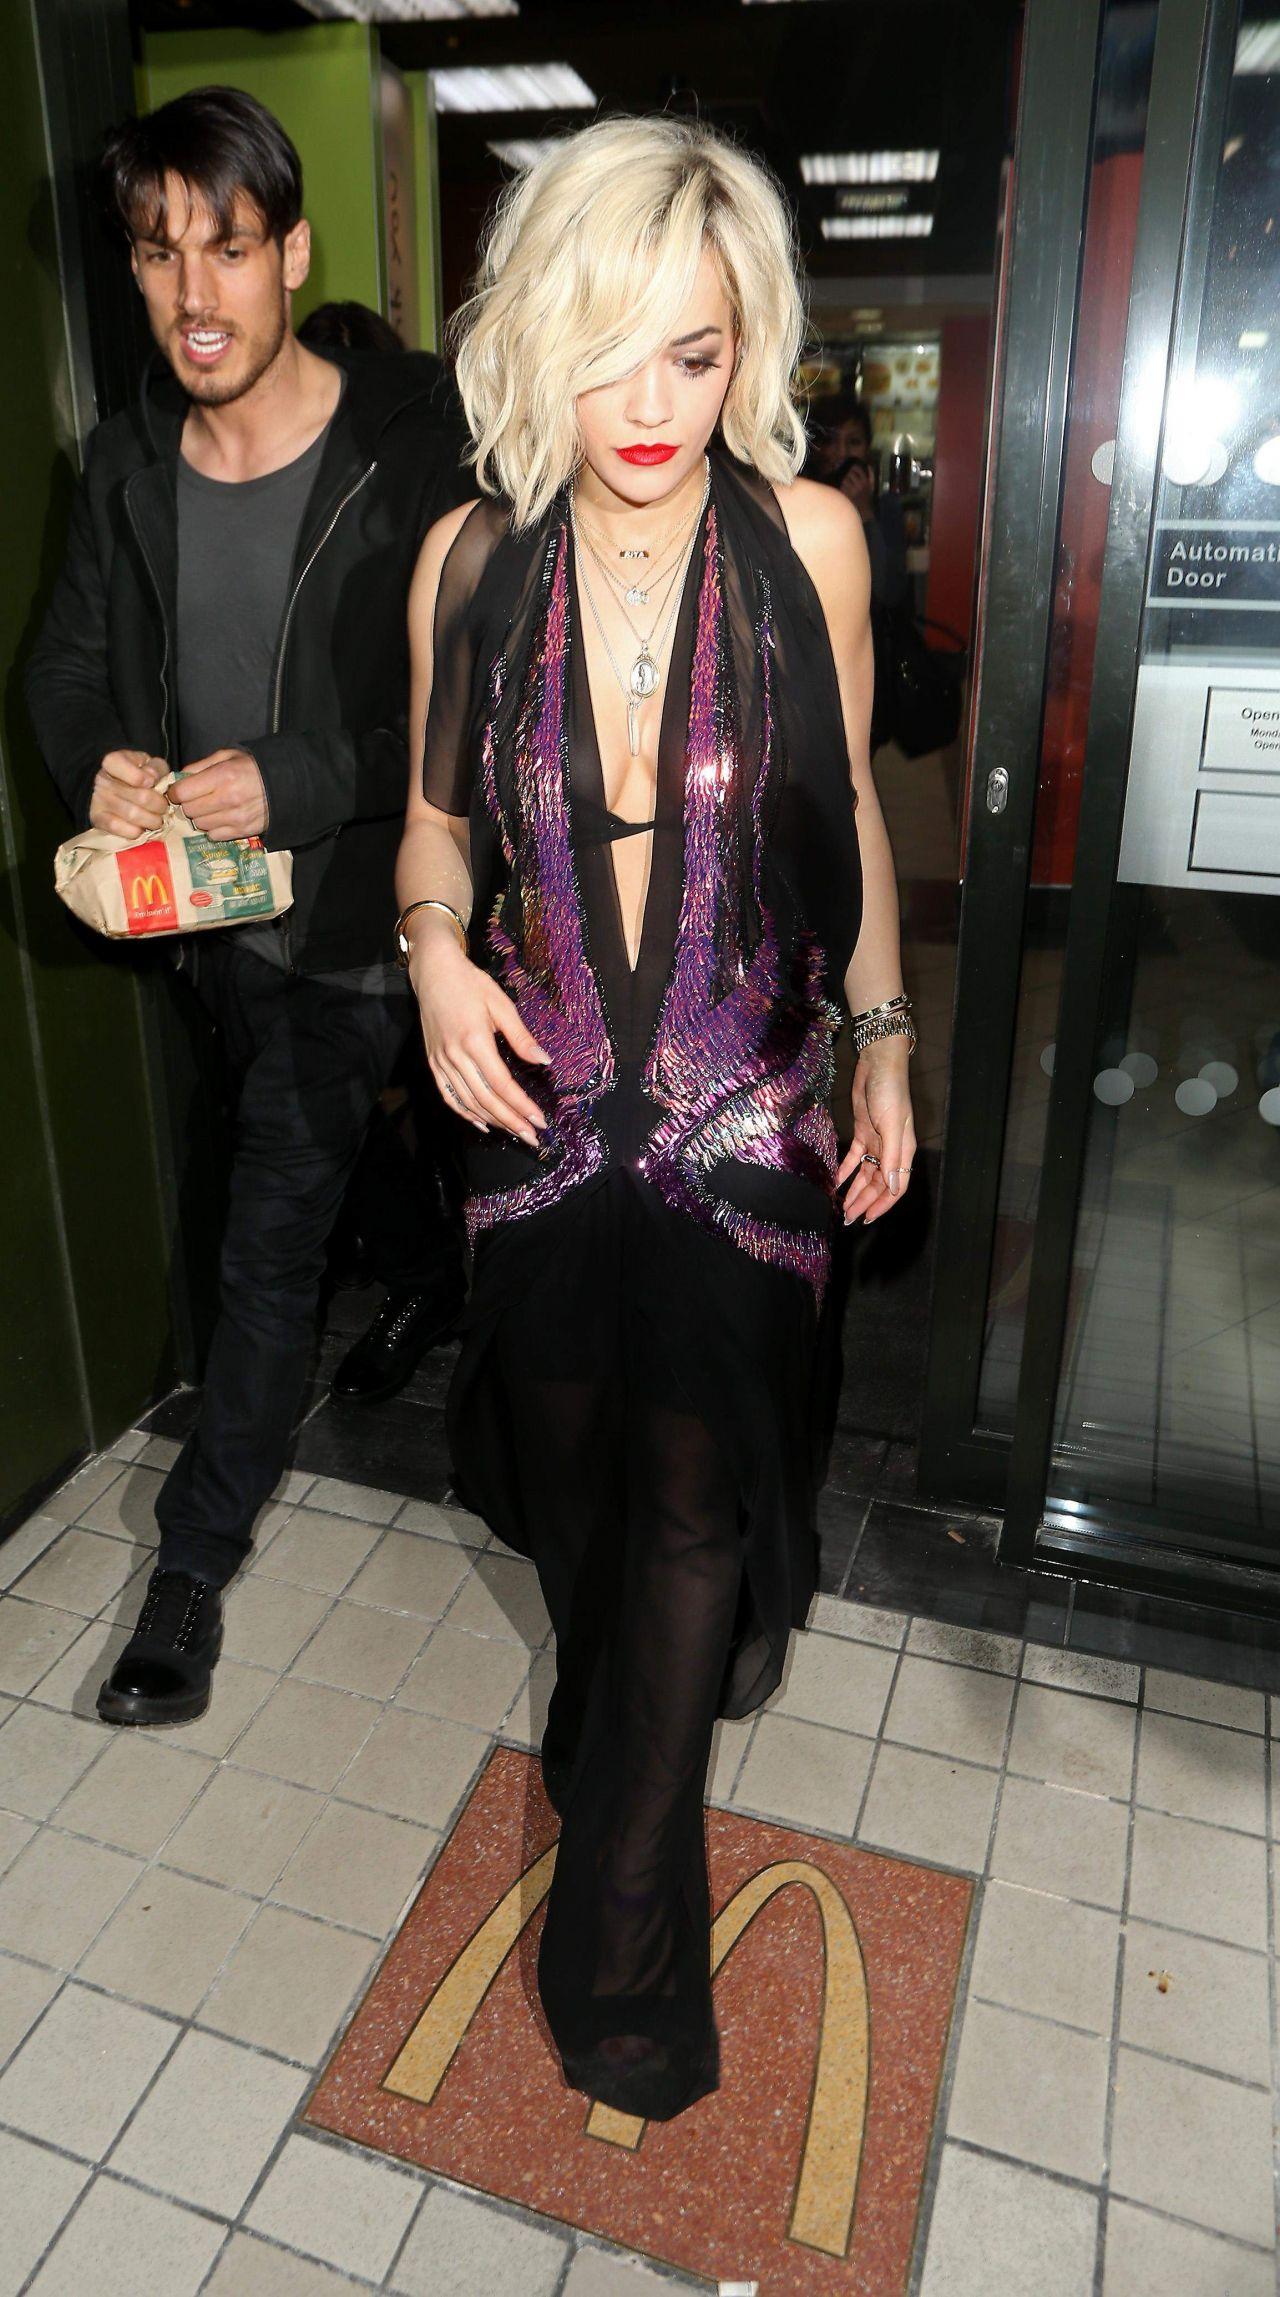 Rita Ora Visited McDonalds in North London, February 2014